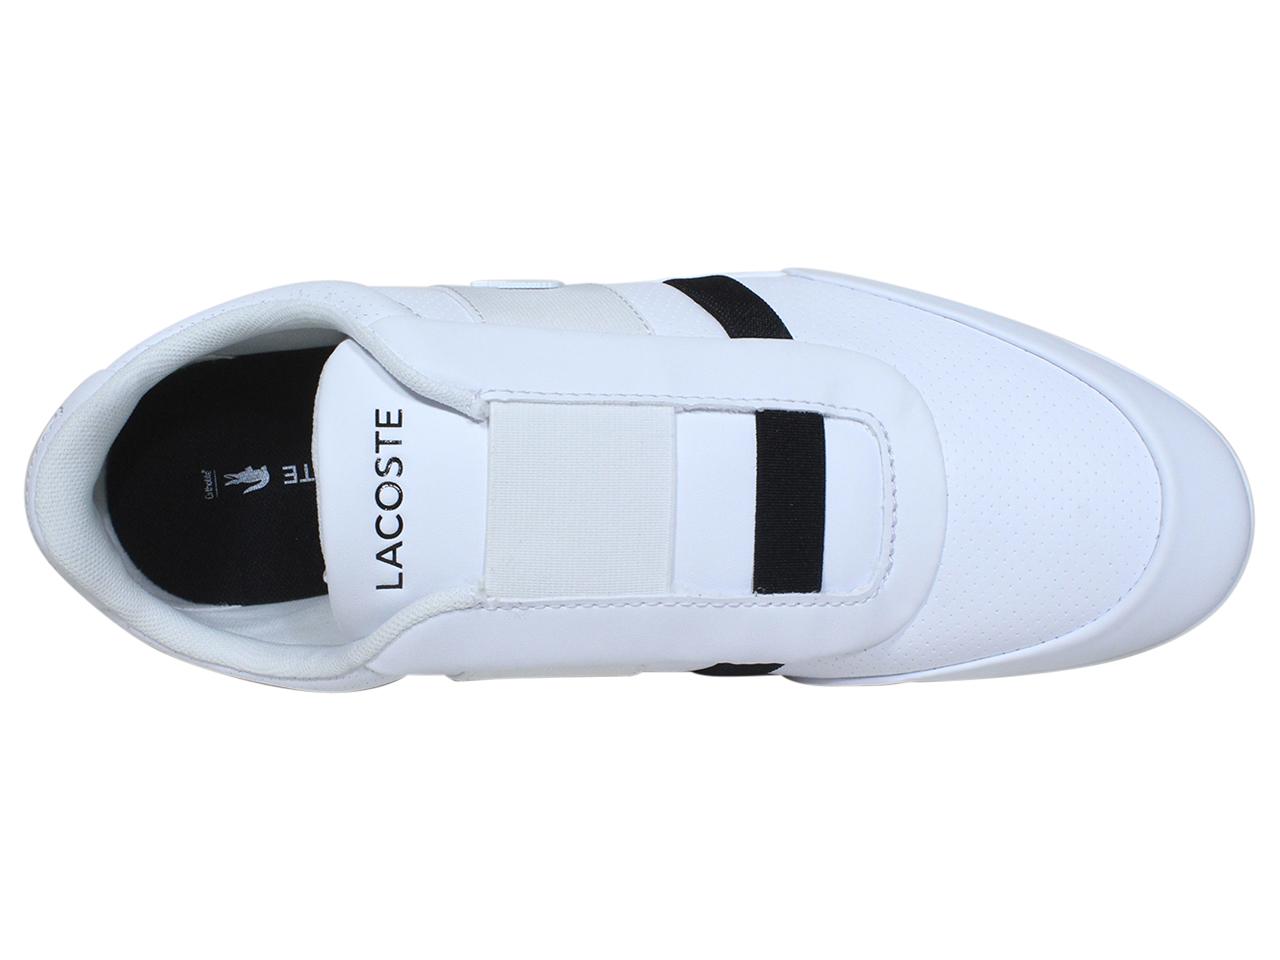 Lacoste-Misano-Elastic-318-Sneakers-Men-039-s-Low-Top-Shoes thumbnail 27